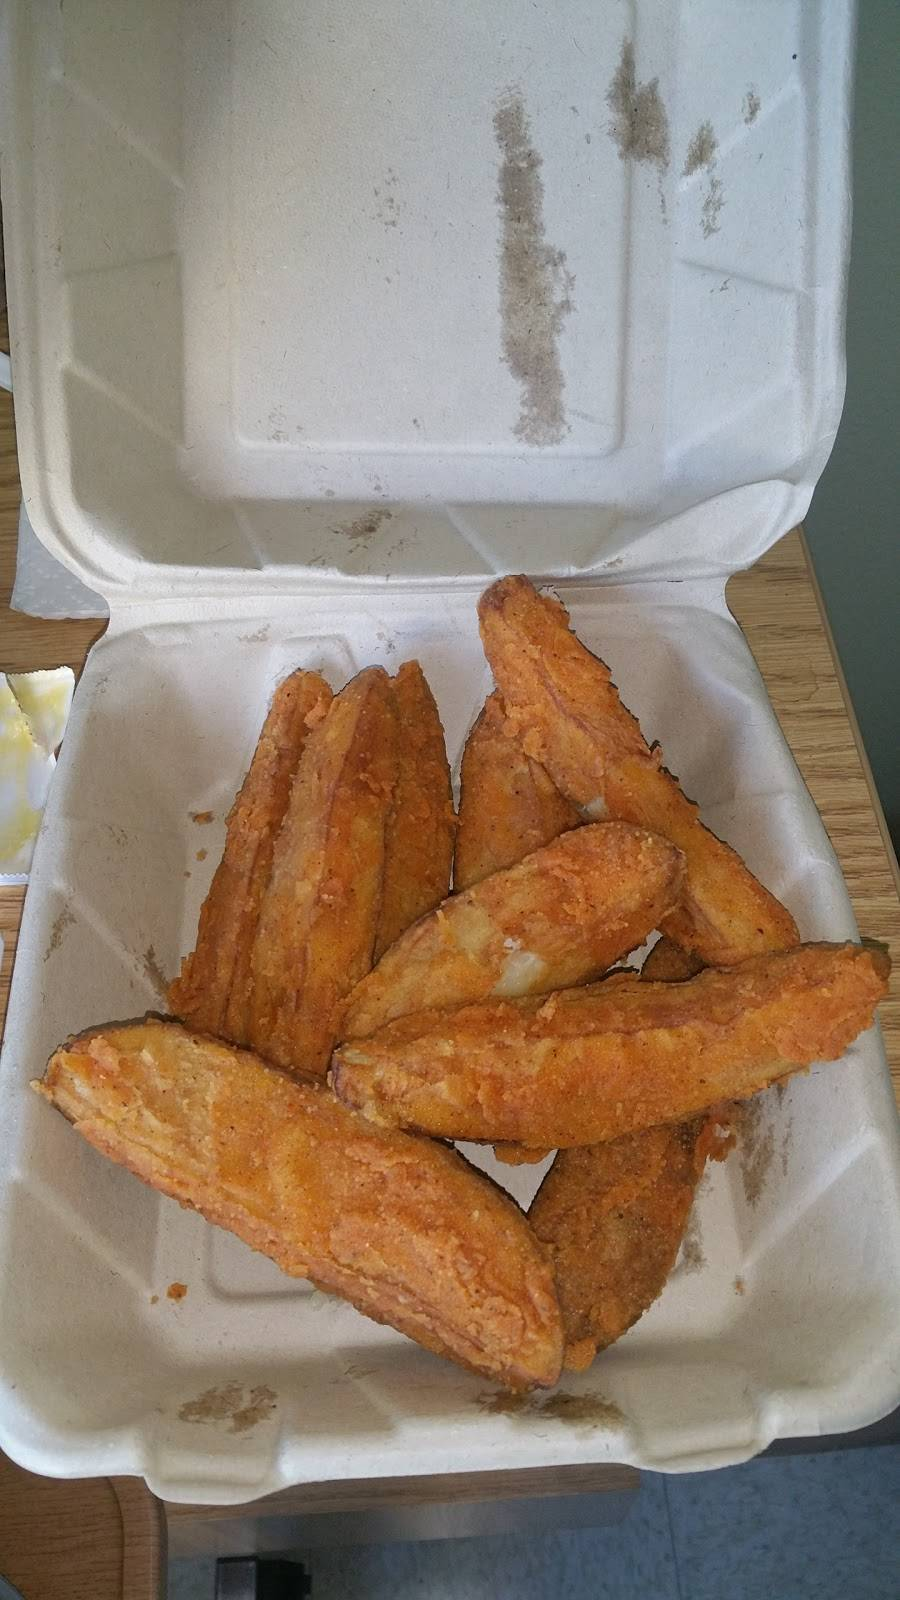 Kings Deli & Grocery - meal takeaway  | Photo 6 of 9 | Address: 2800 E Cherry St # C, Seattle, WA 98122, USA | Phone: (206) 720-5204